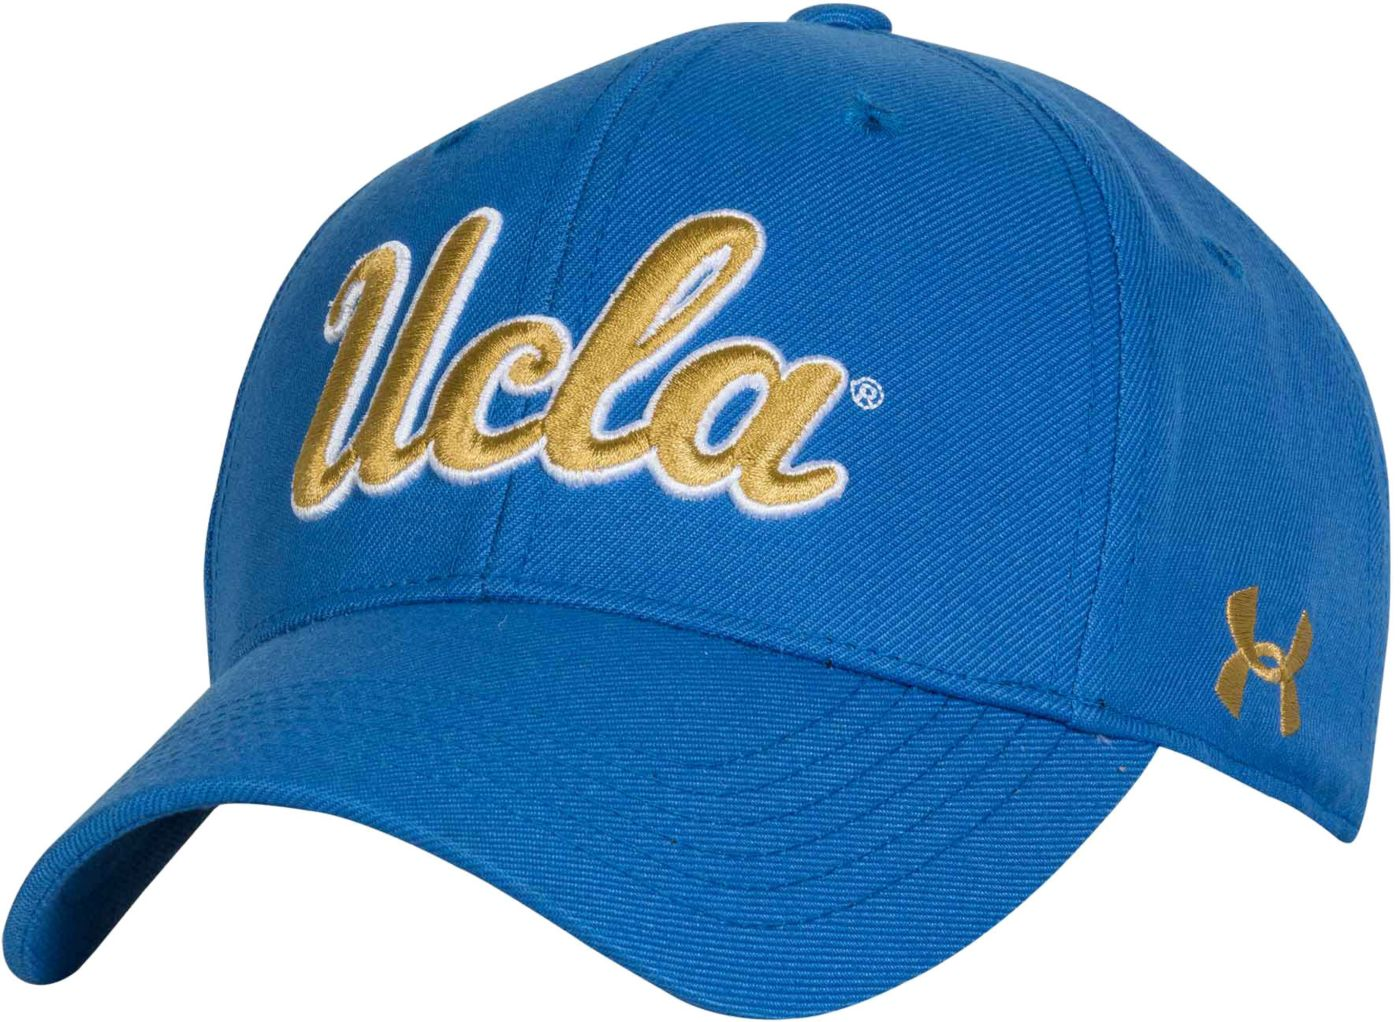 Under Armour Men's UCLA Bruins True Blue Adjustable Hat